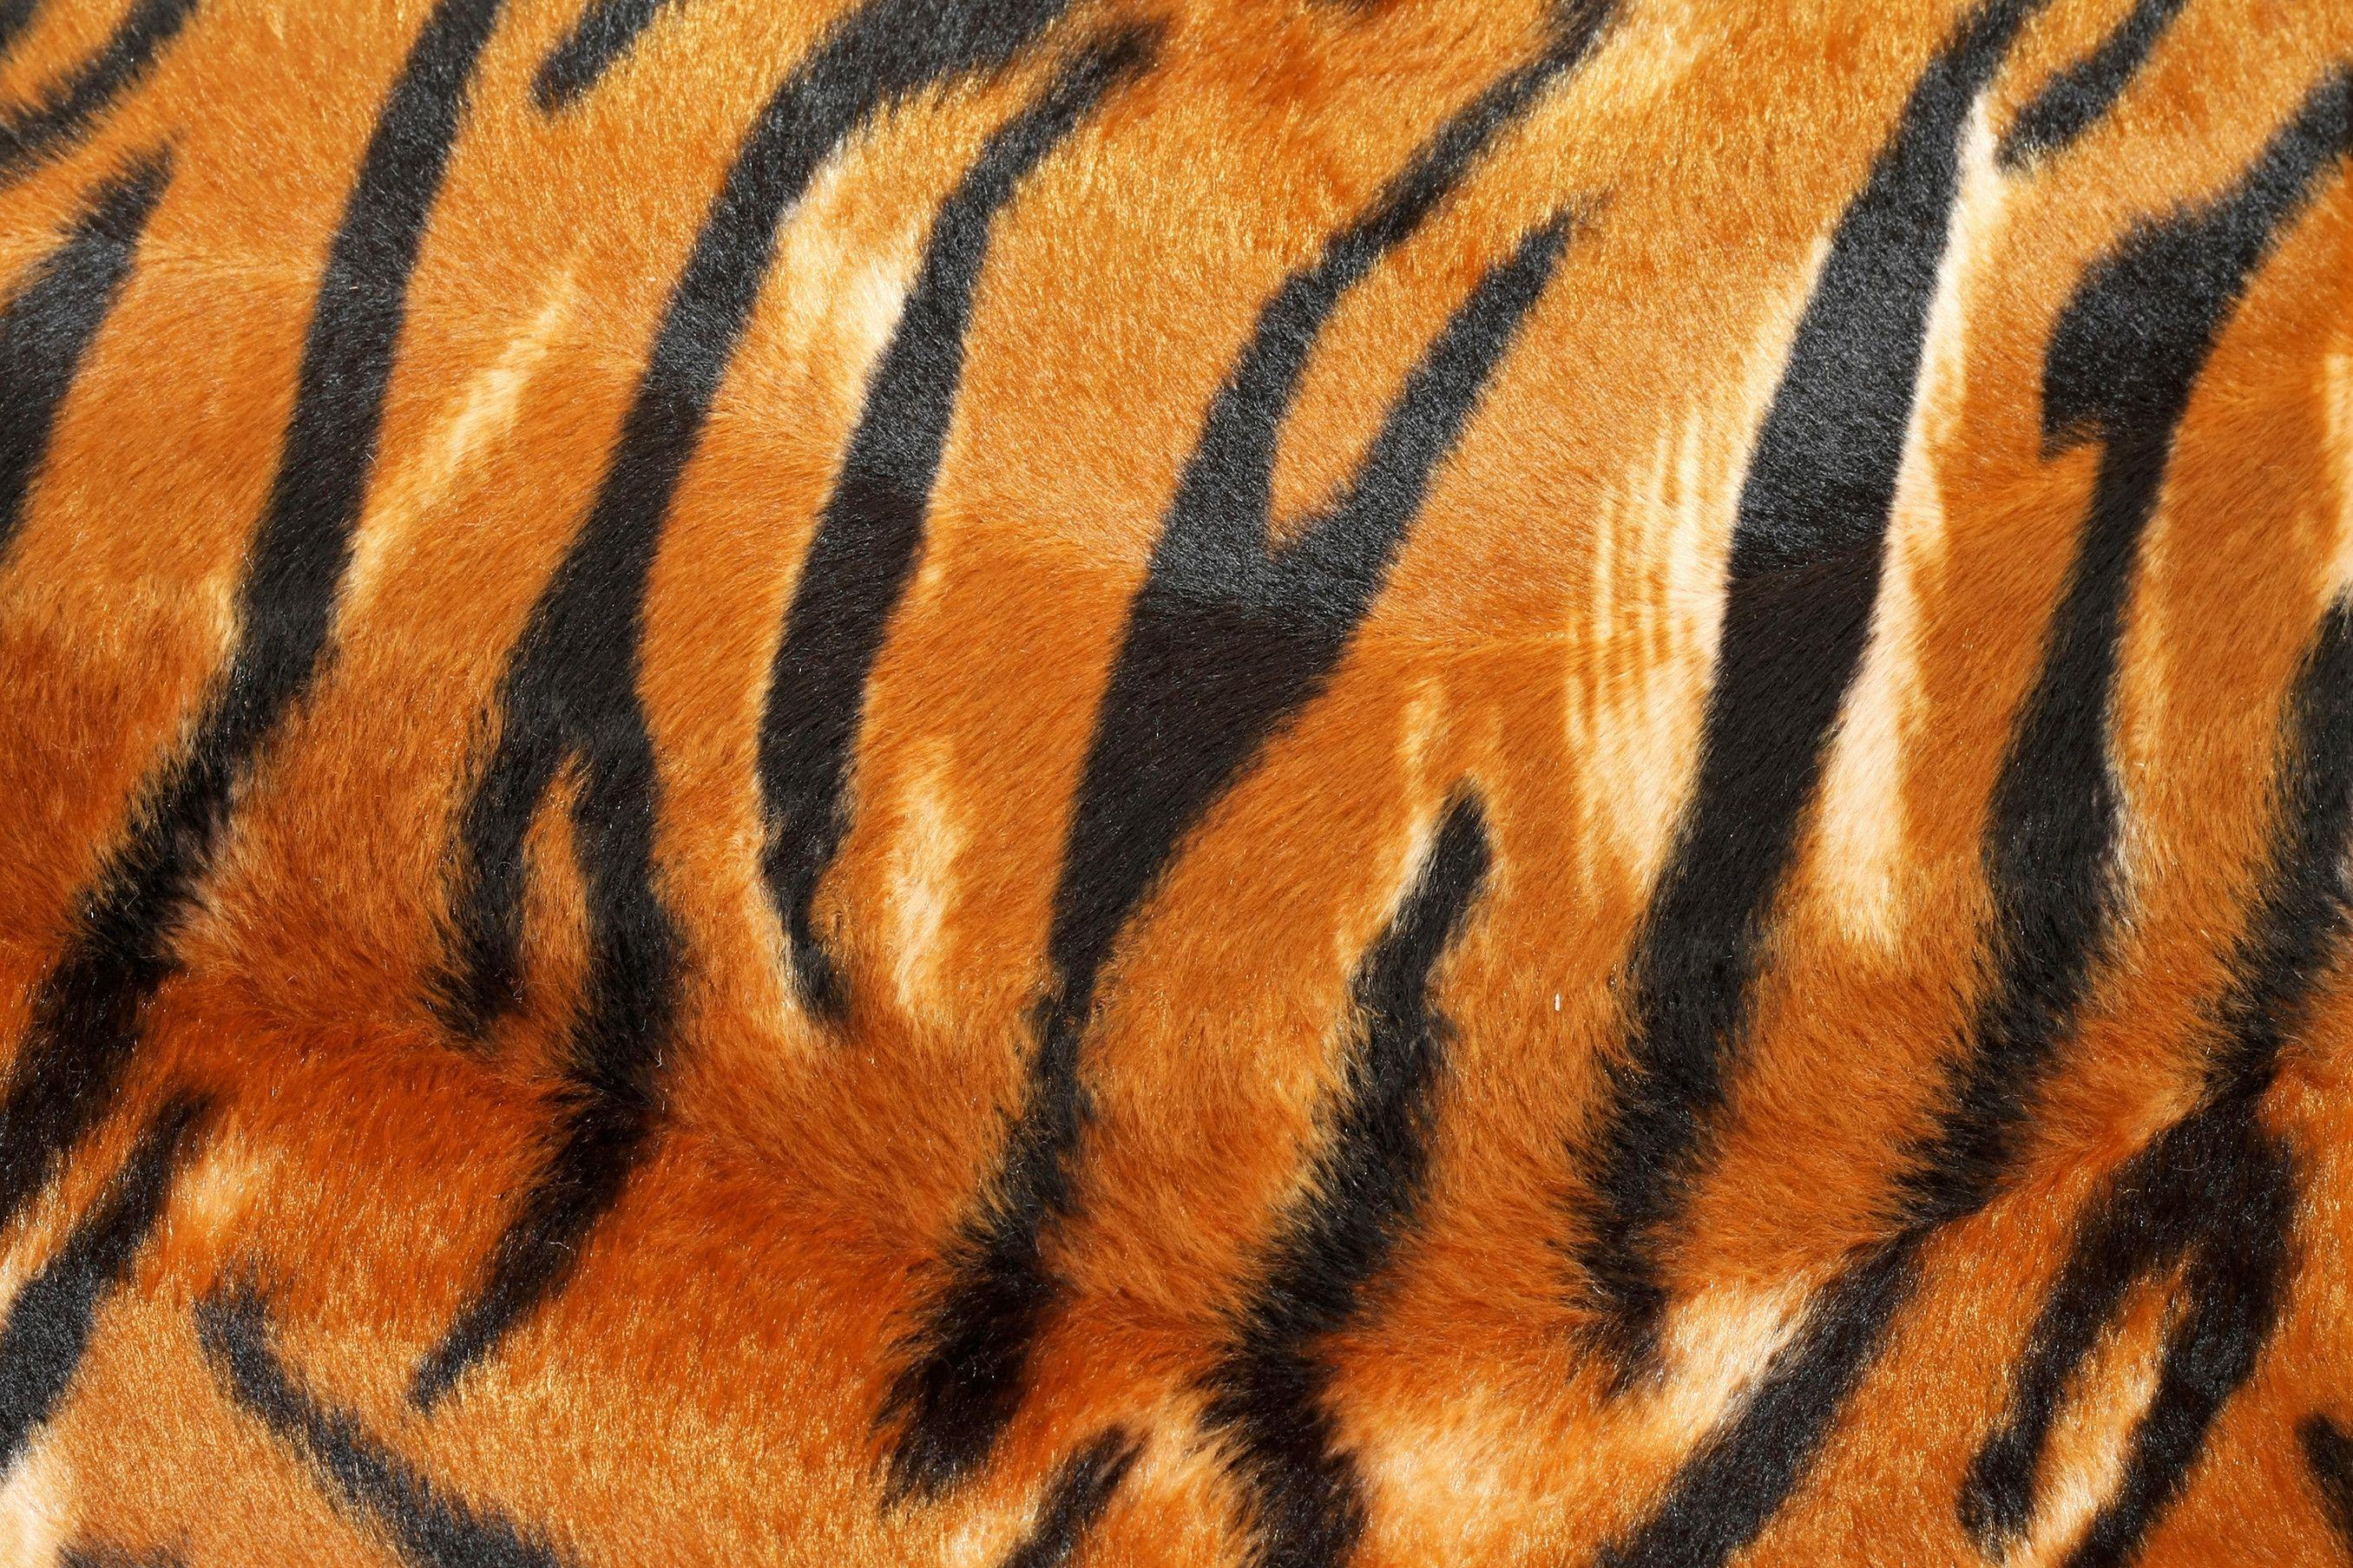 Tiger Pattern In Hd Hd Desktop Wallpaper Instagram Photo Background Image Animal Print Wallpaper Print Tiger Skin